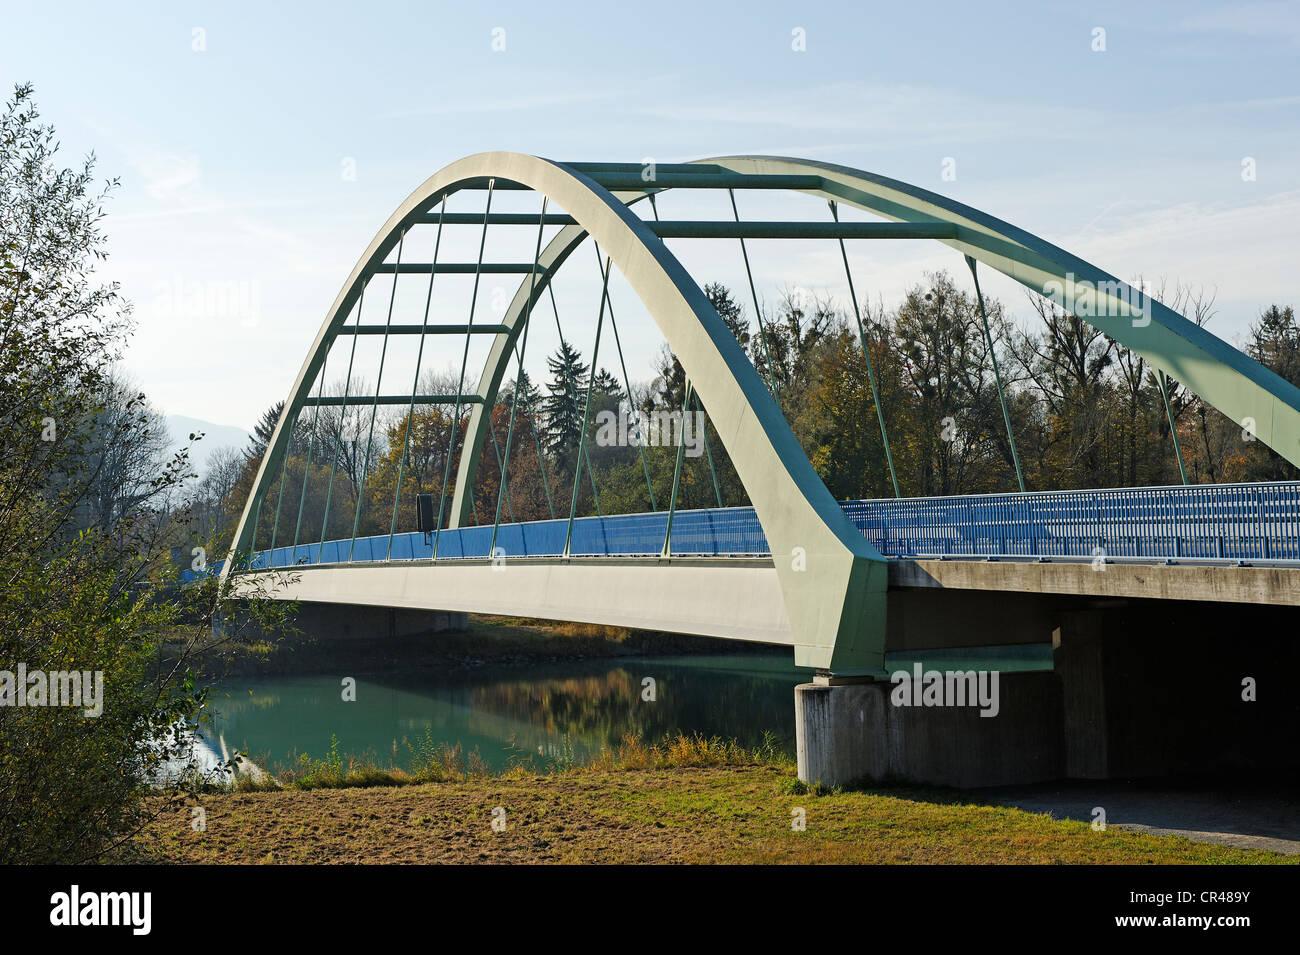 Innbruecke bridge between Raubling and Neubeuern, Upper Bavaria, Germany, Europe - Stock Image